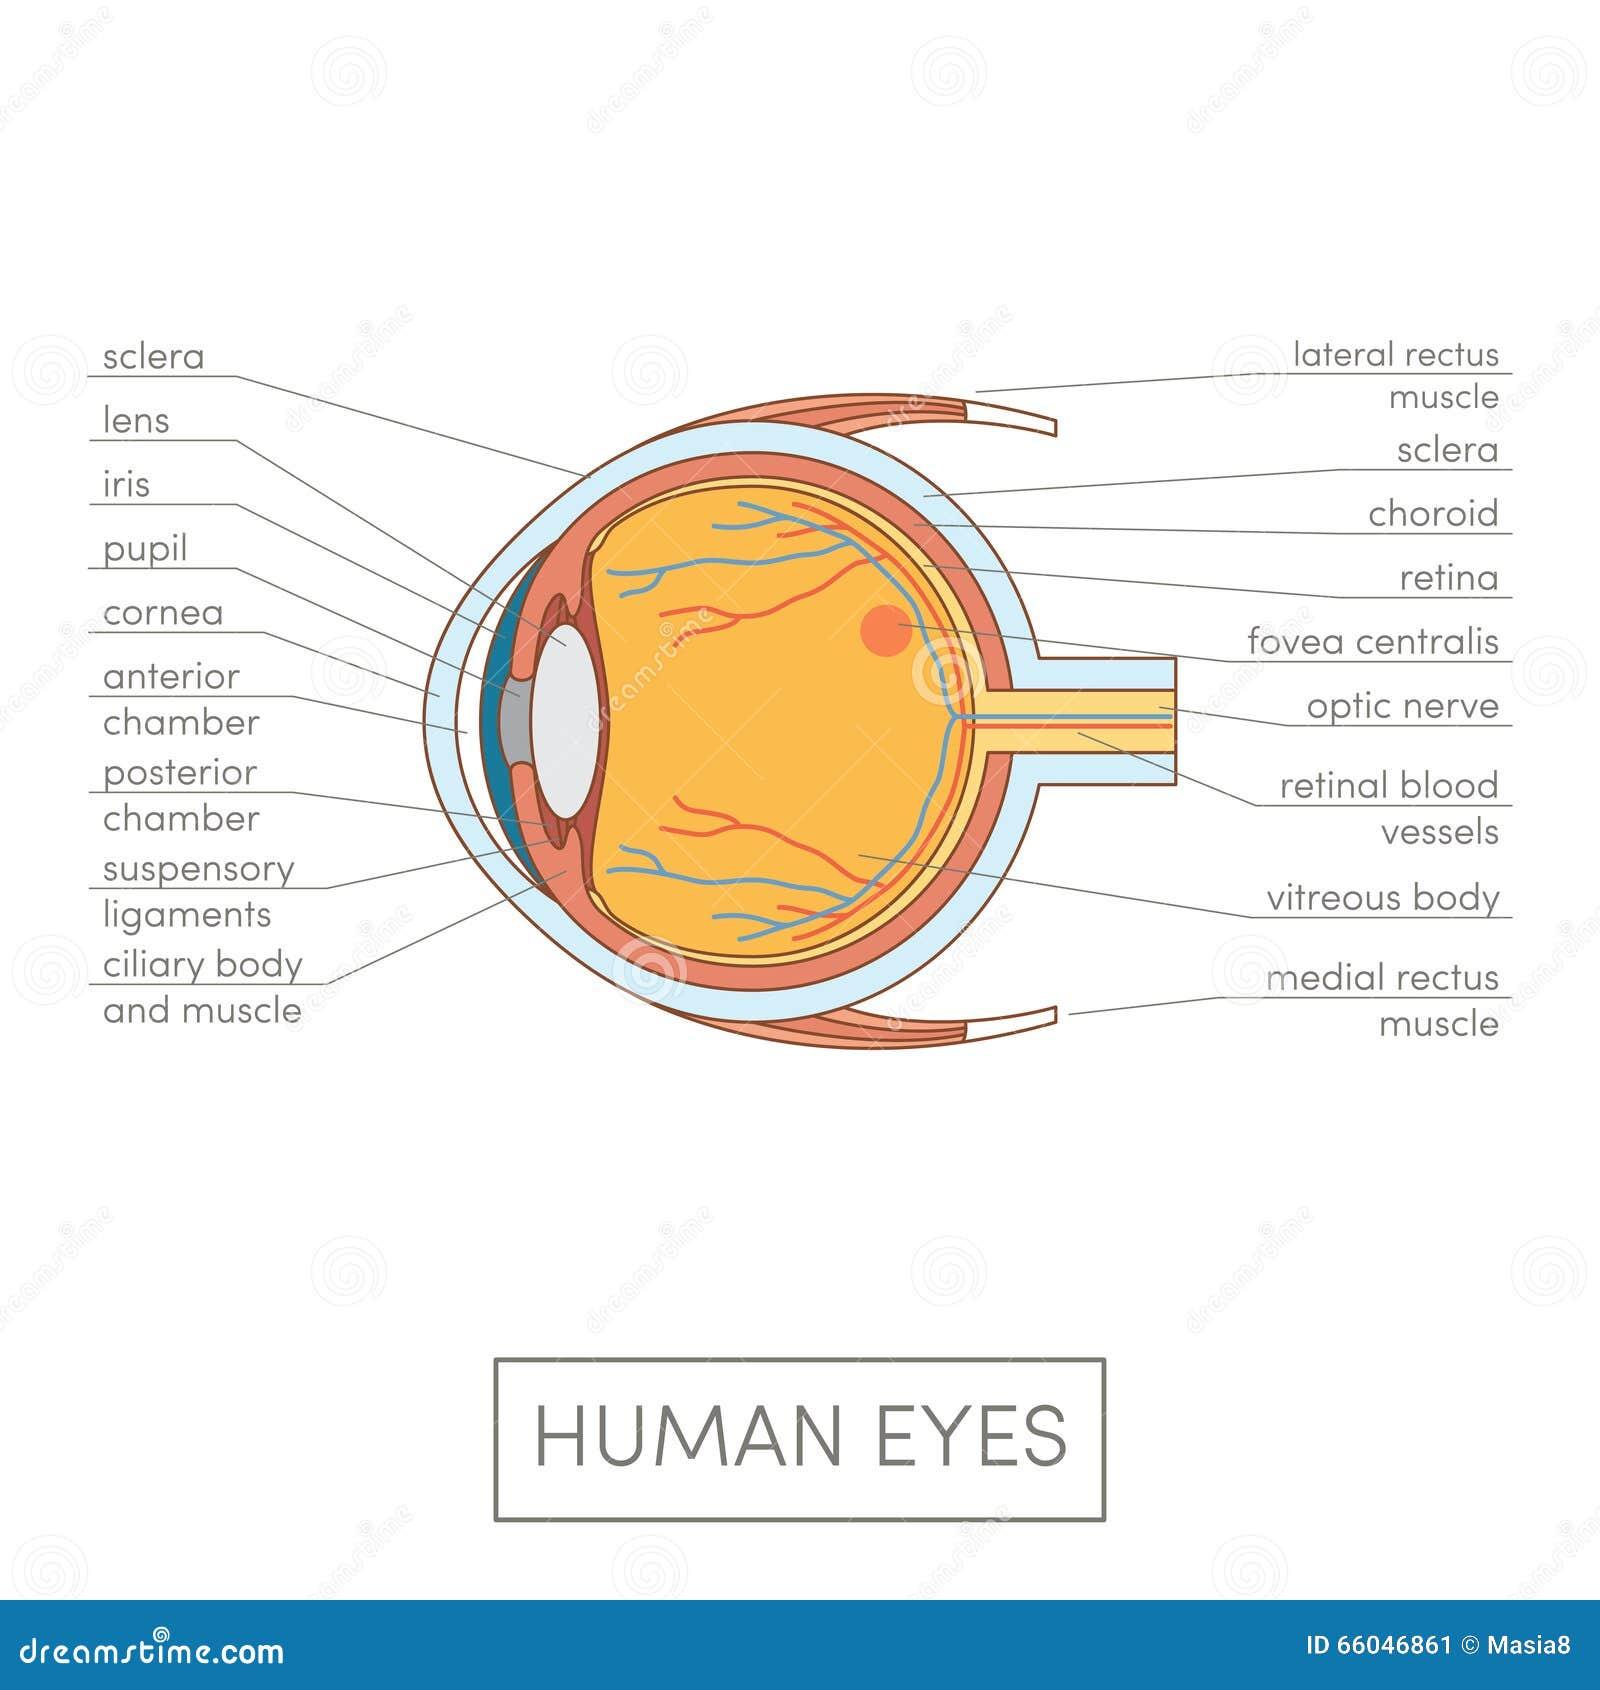 Human eye anatomy stock illustration. Illustration of anterior ...